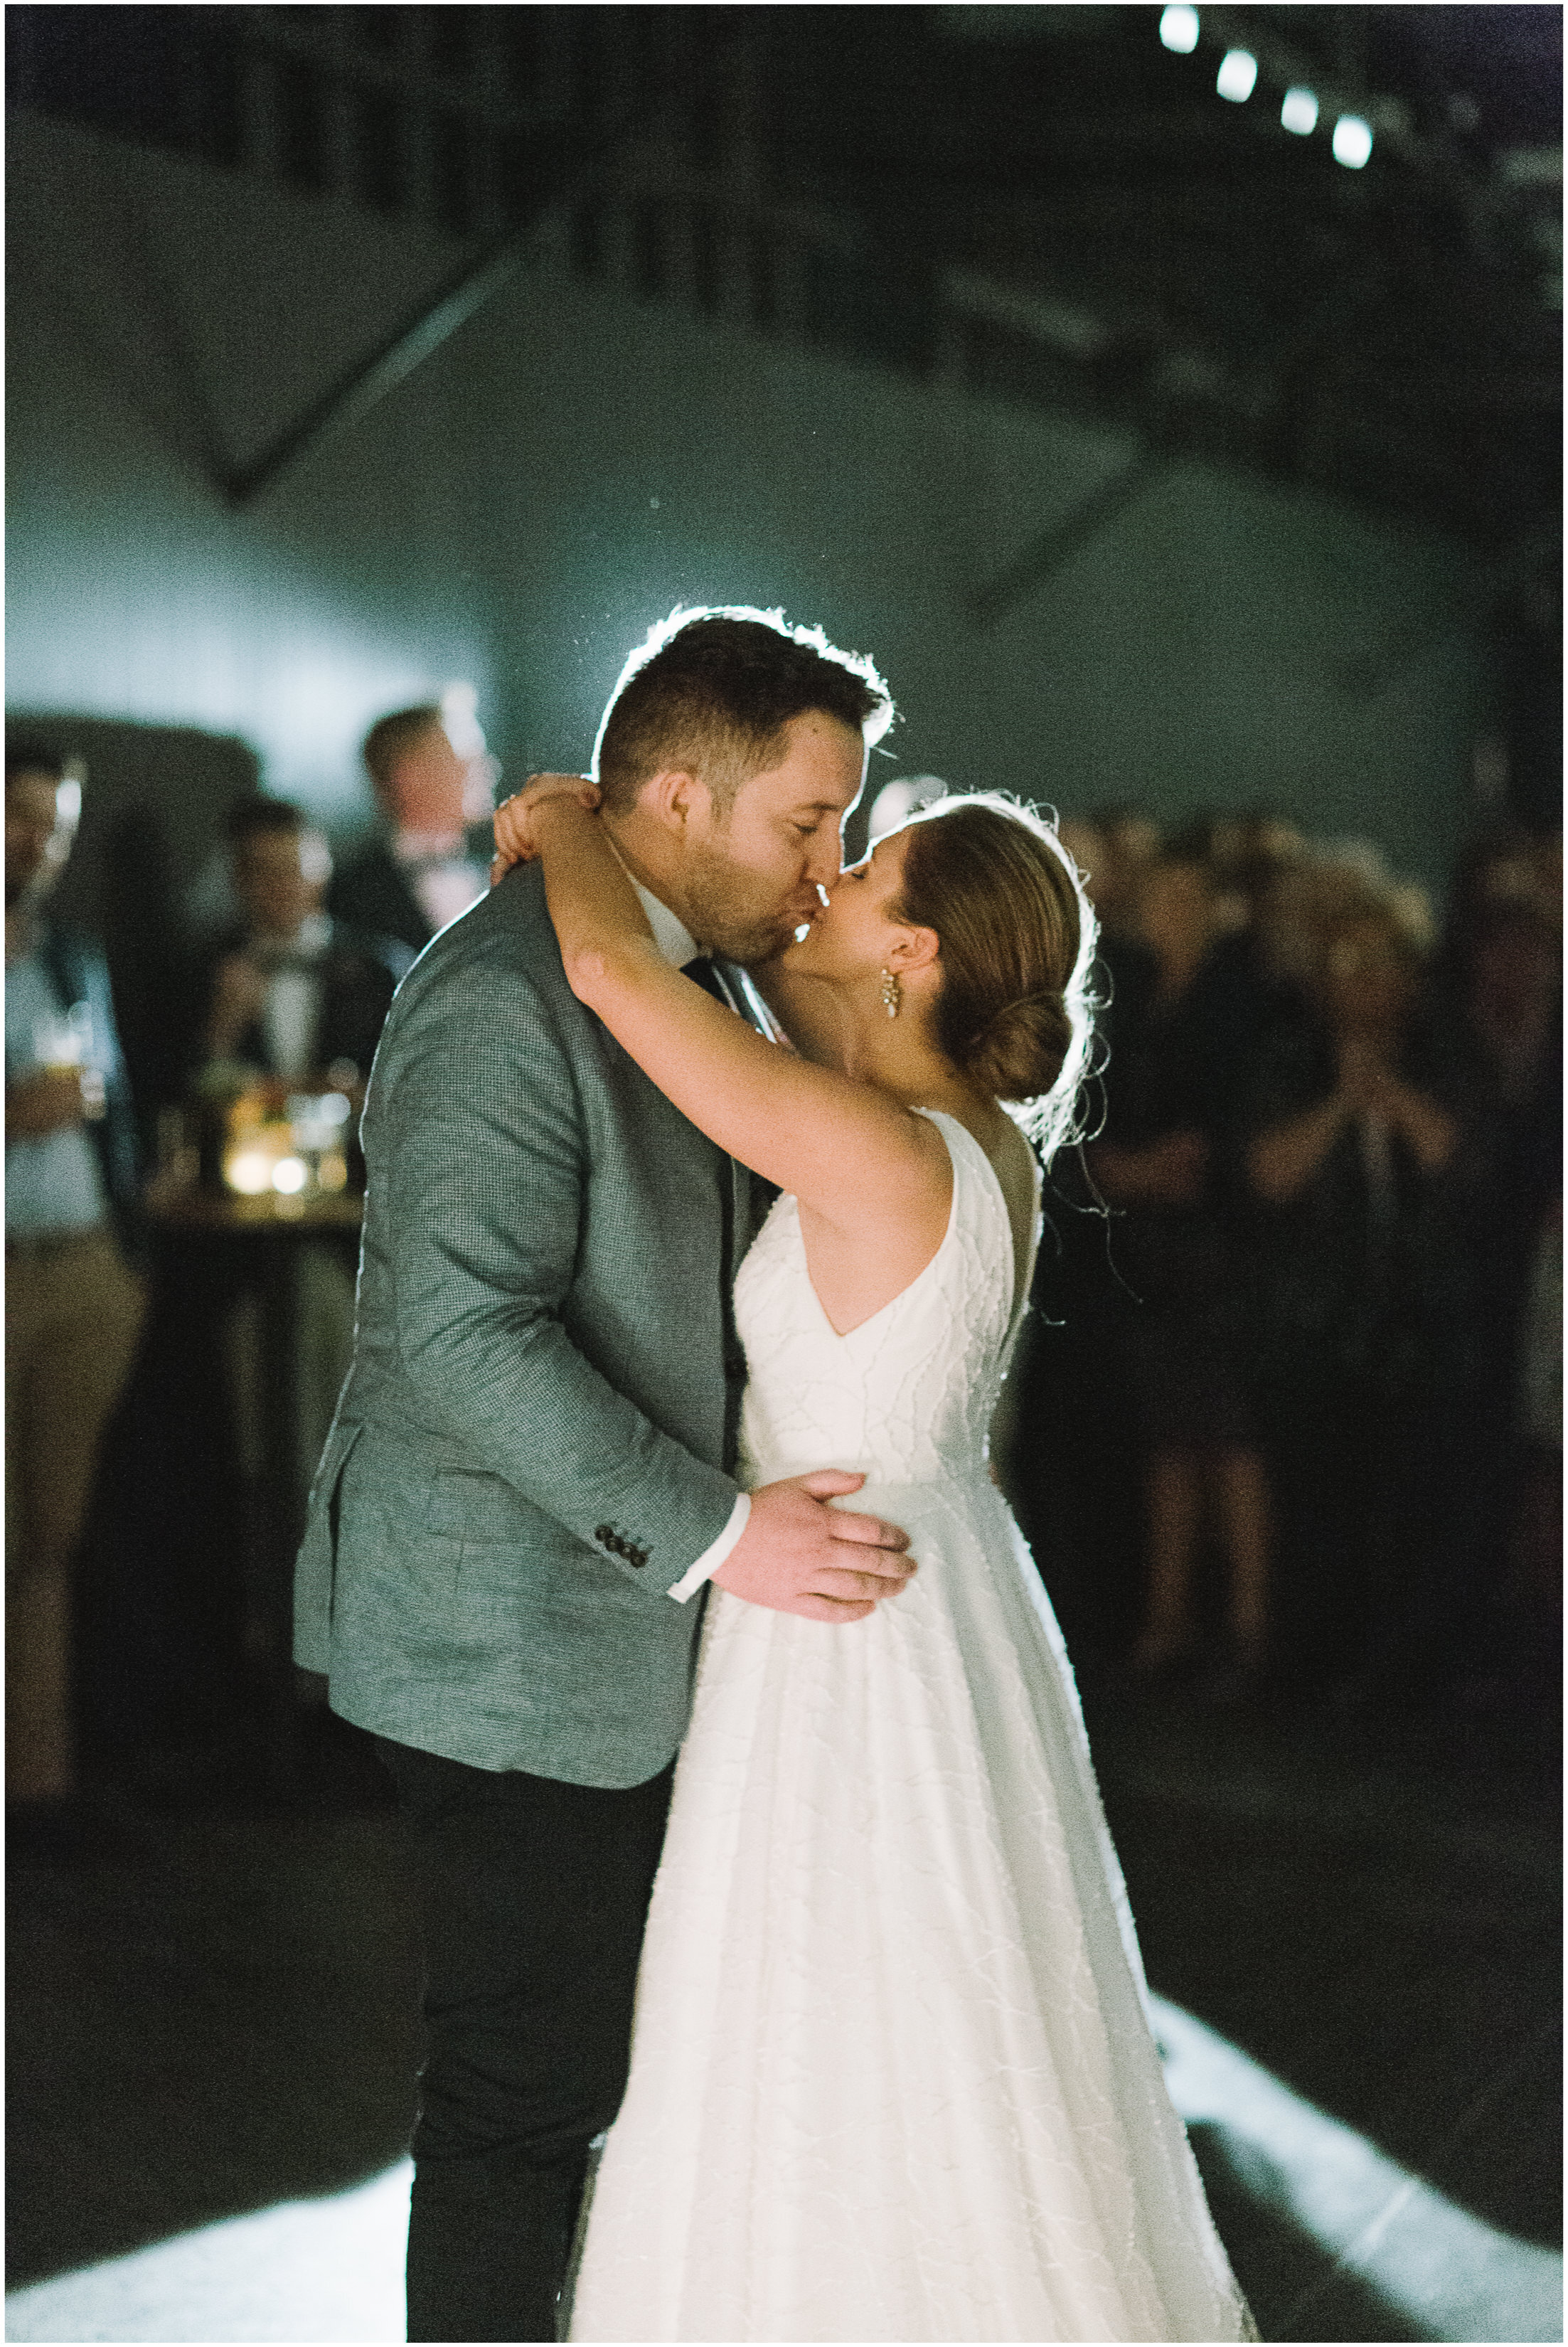 refinery-brisbane-wedding-photography-film-photographer-fine-art-60.jpg